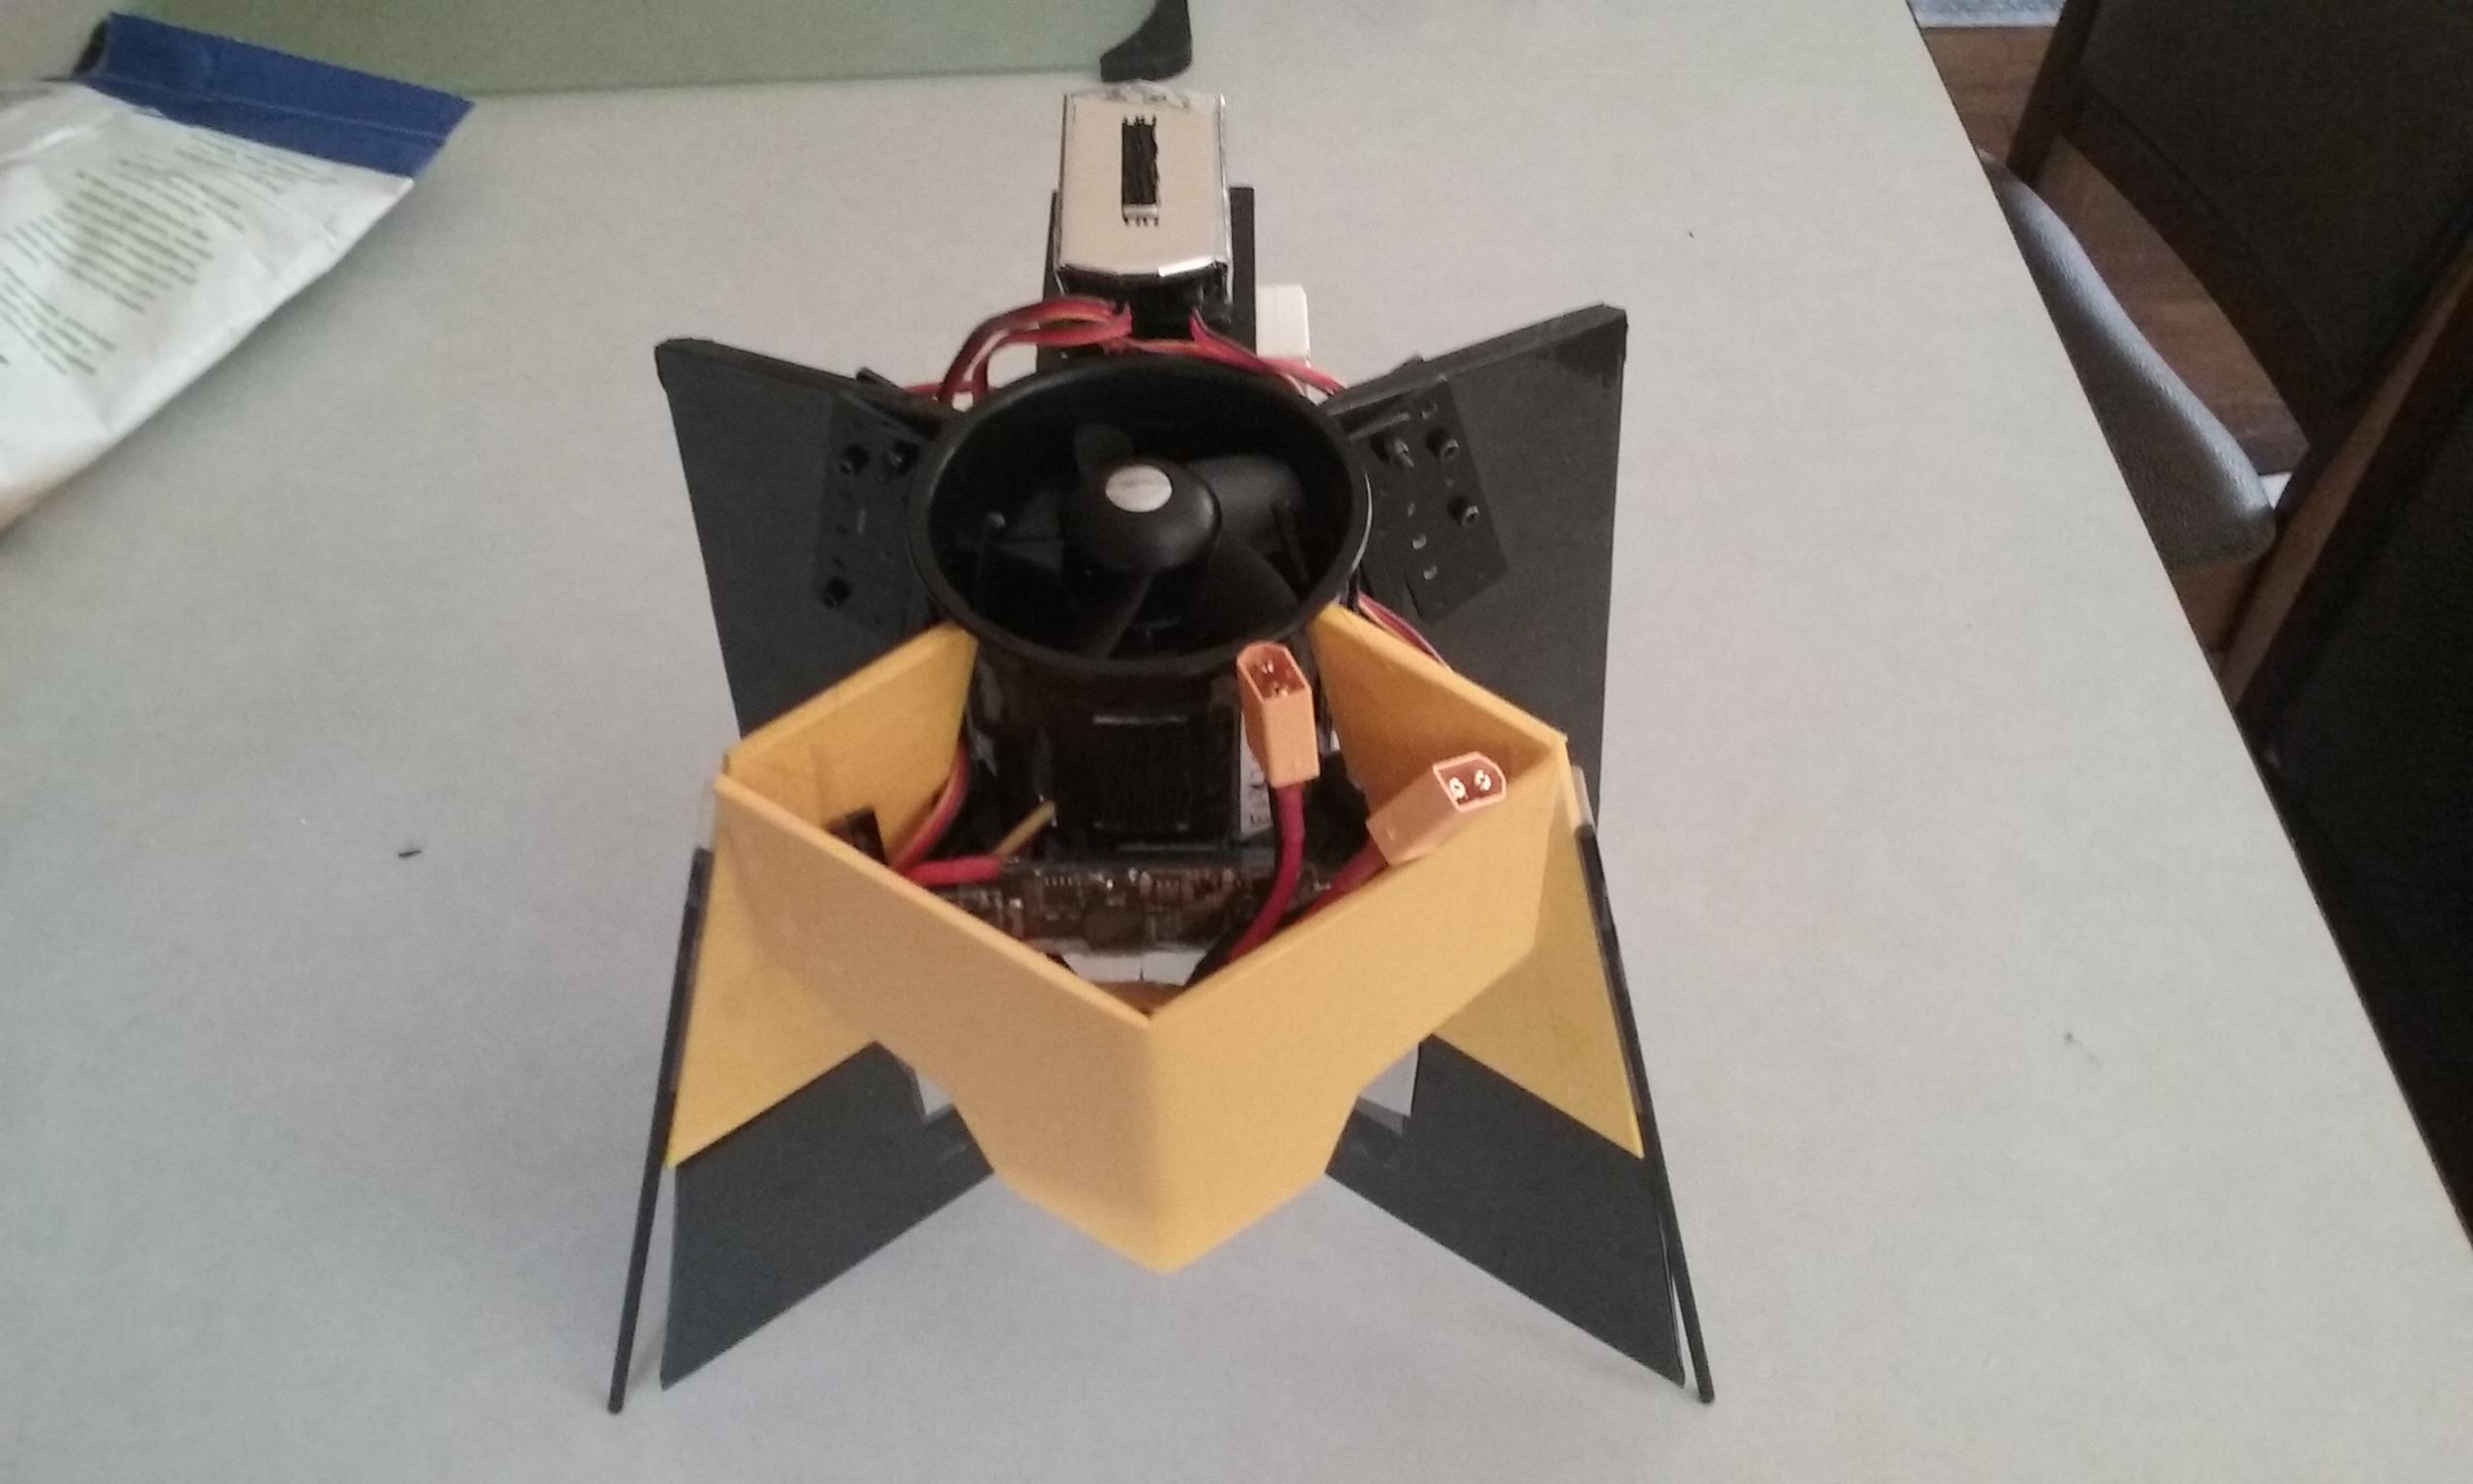 transforming vtol edf jet drone varitech robotech project page 2 r c tech forums. Black Bedroom Furniture Sets. Home Design Ideas